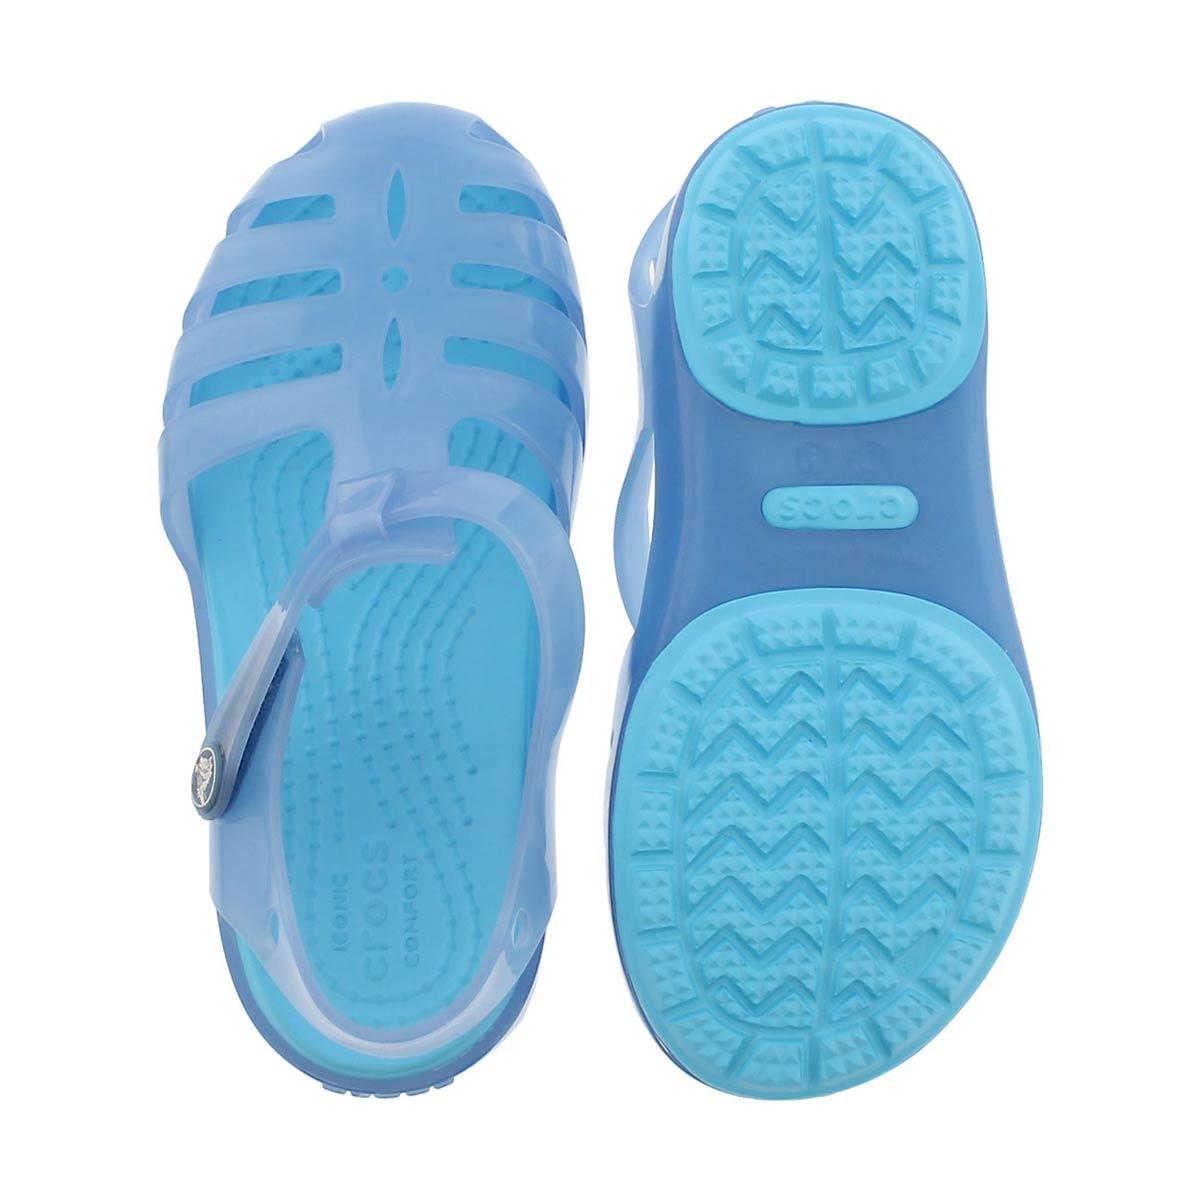 Grls Isabella dusty blue casual sandal